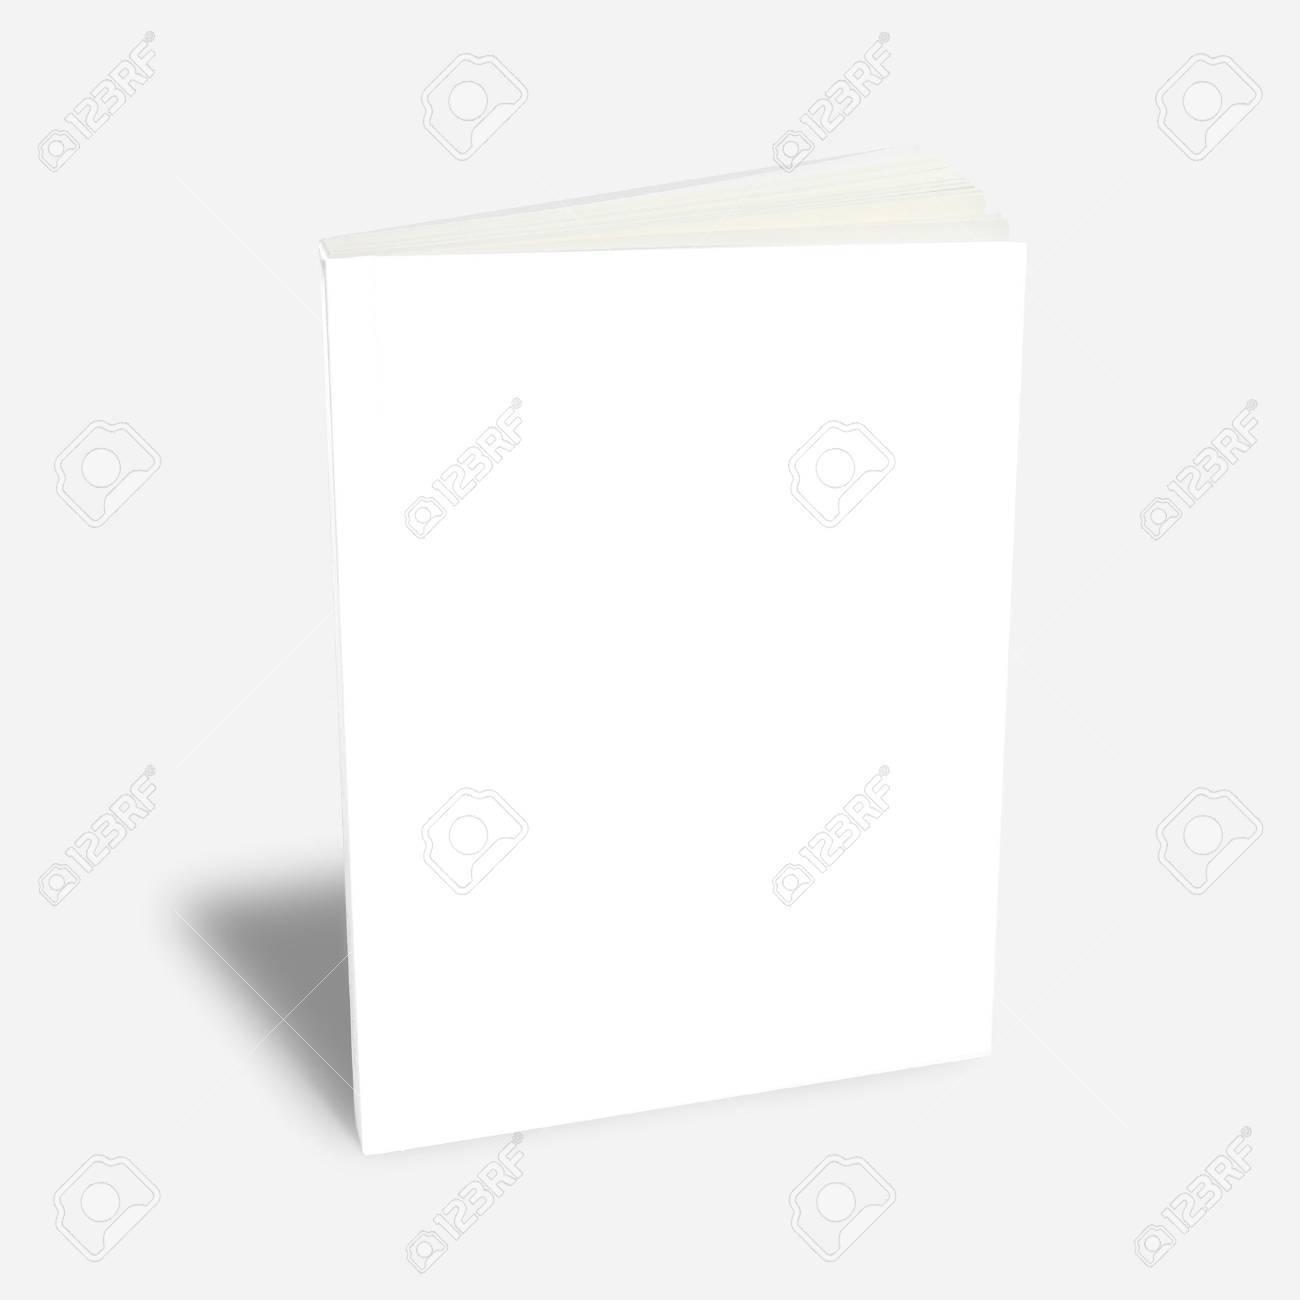 white book magazine Stock Photo - 9702542